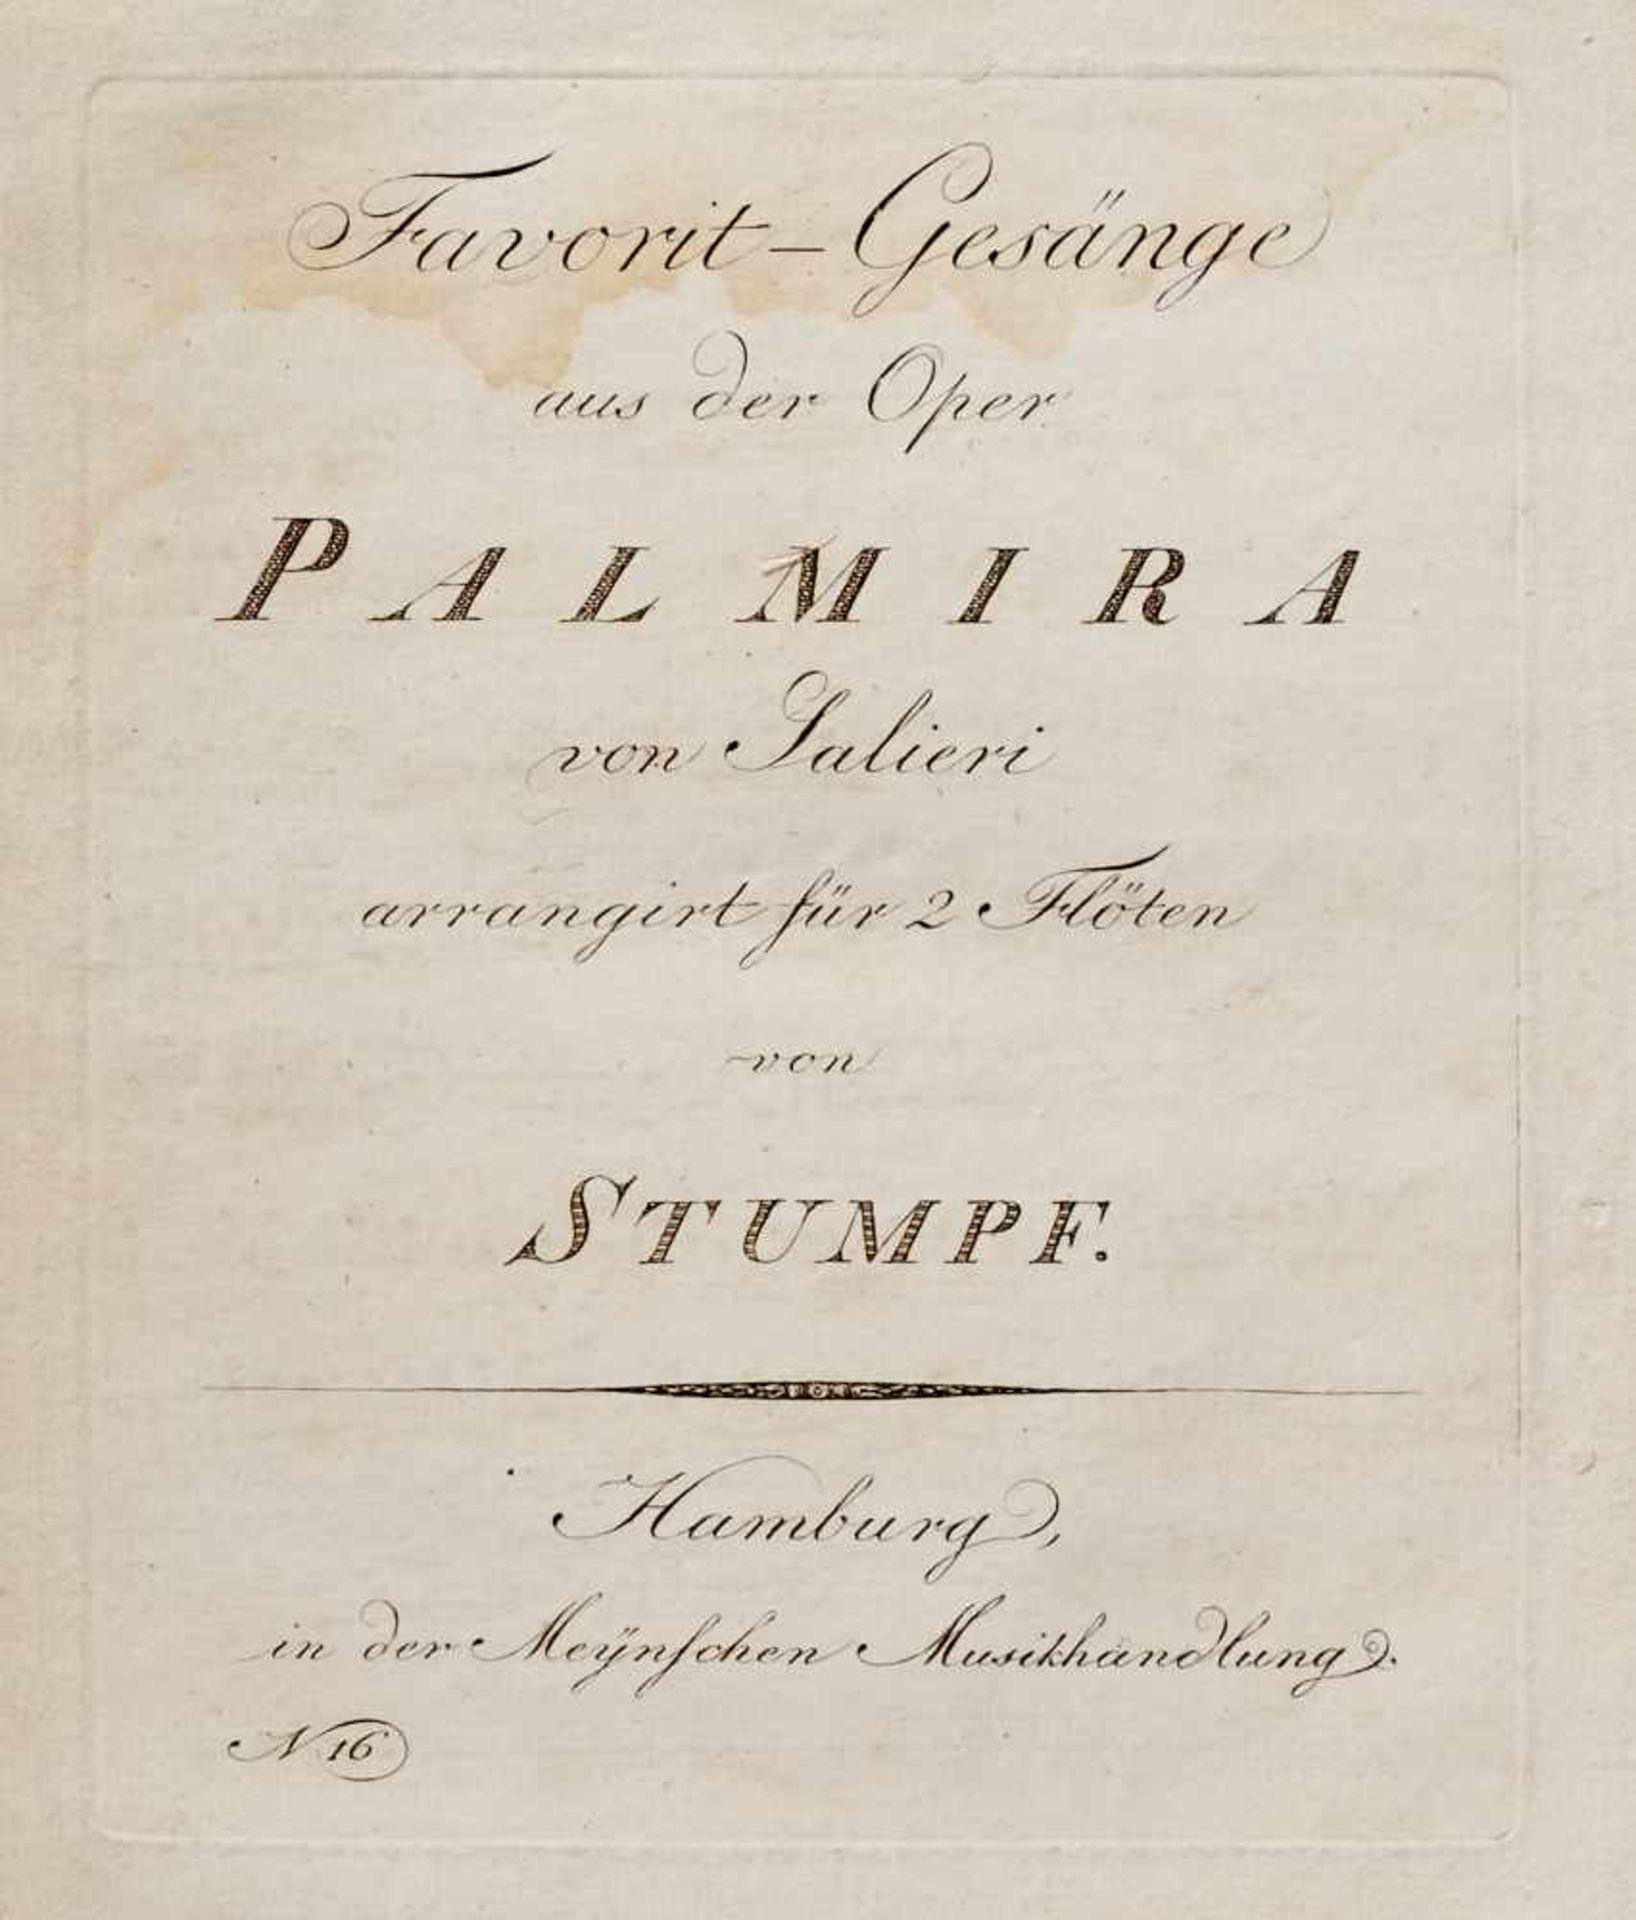 Salieri - Stumpf, (J. Ch.),